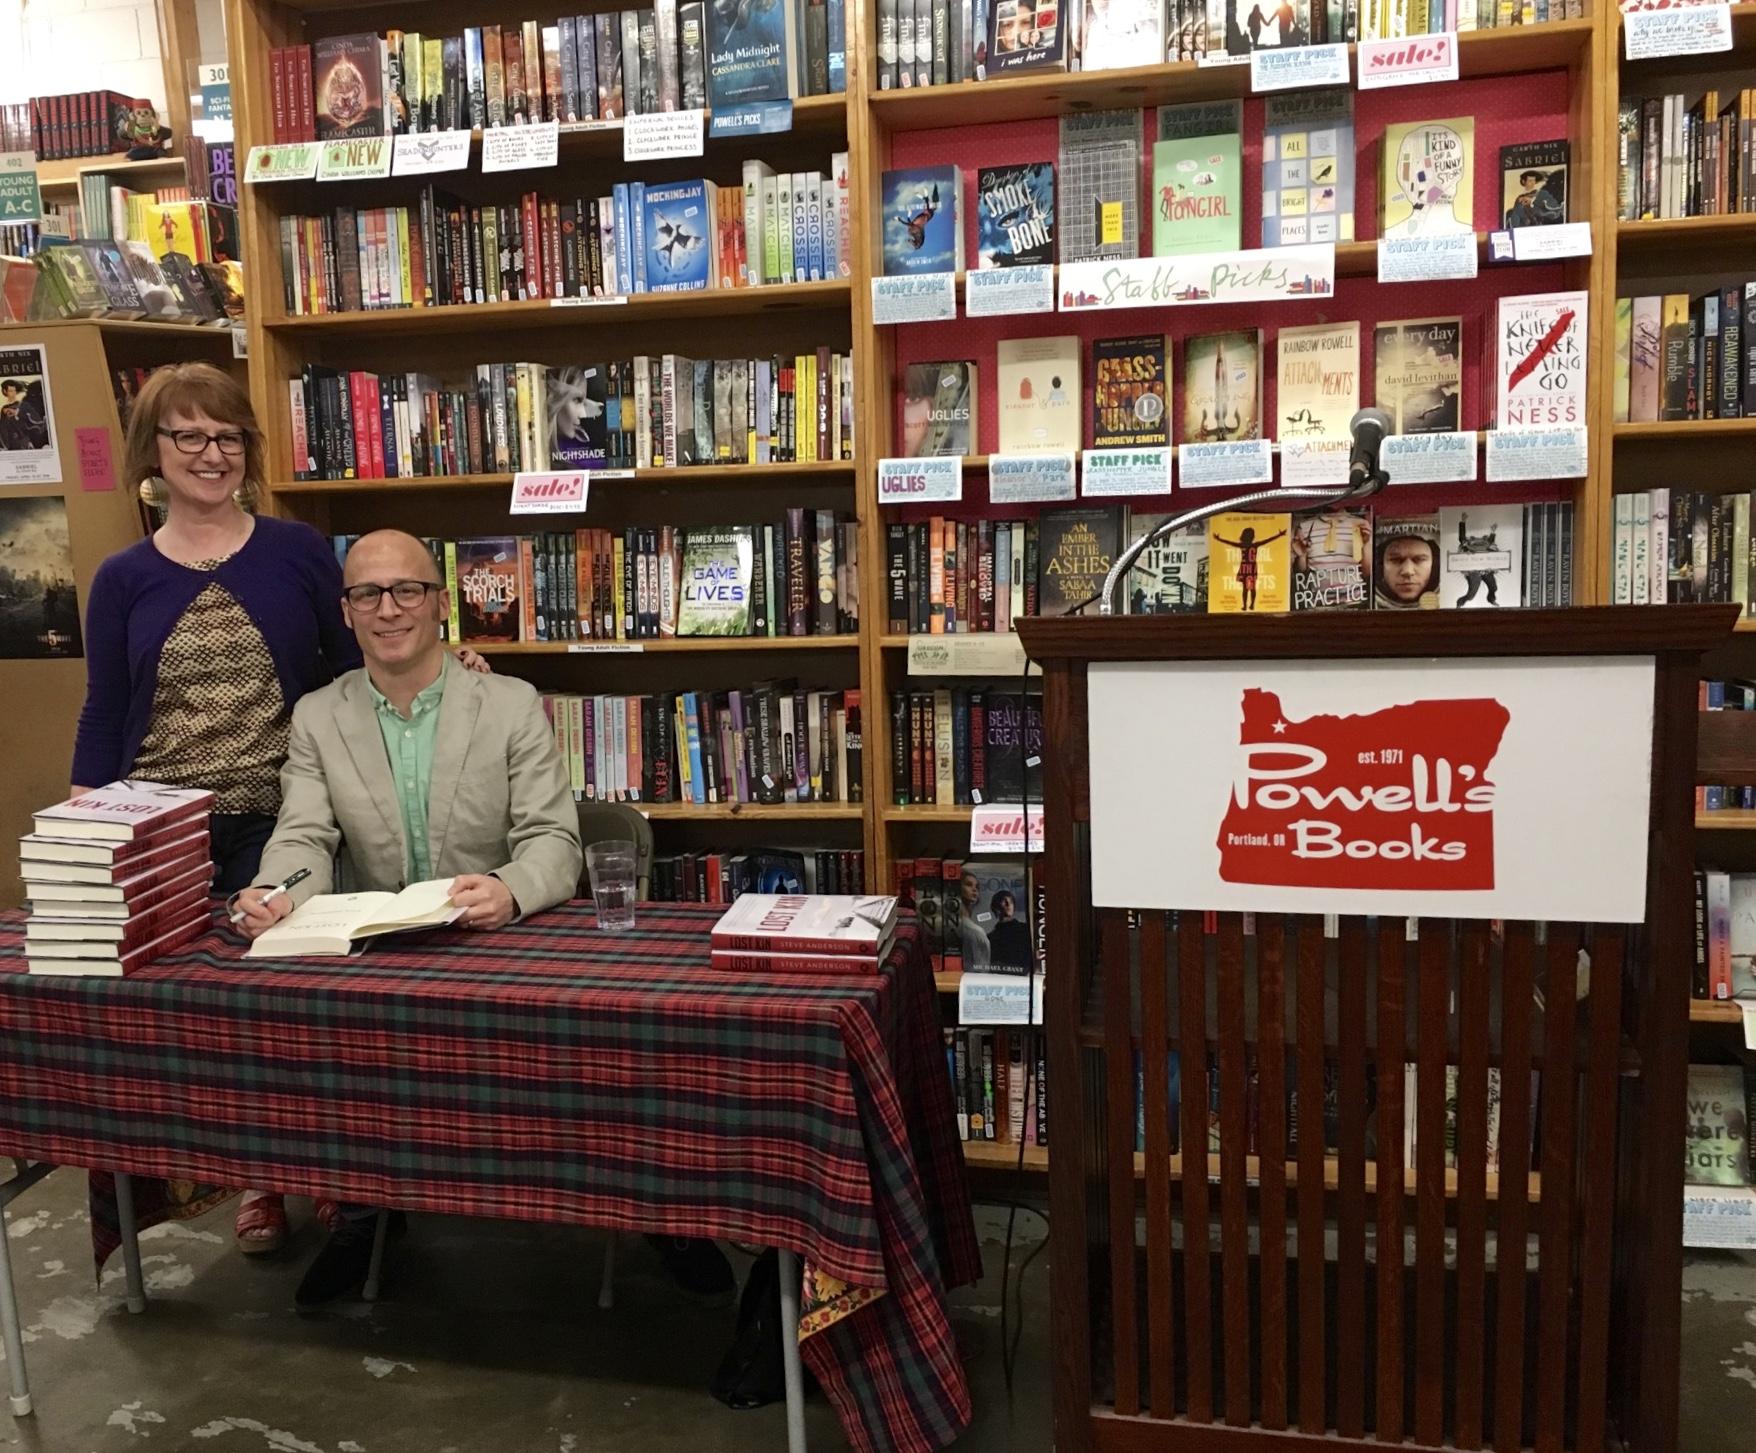 Powell's Books on Hawthorne, April 2016